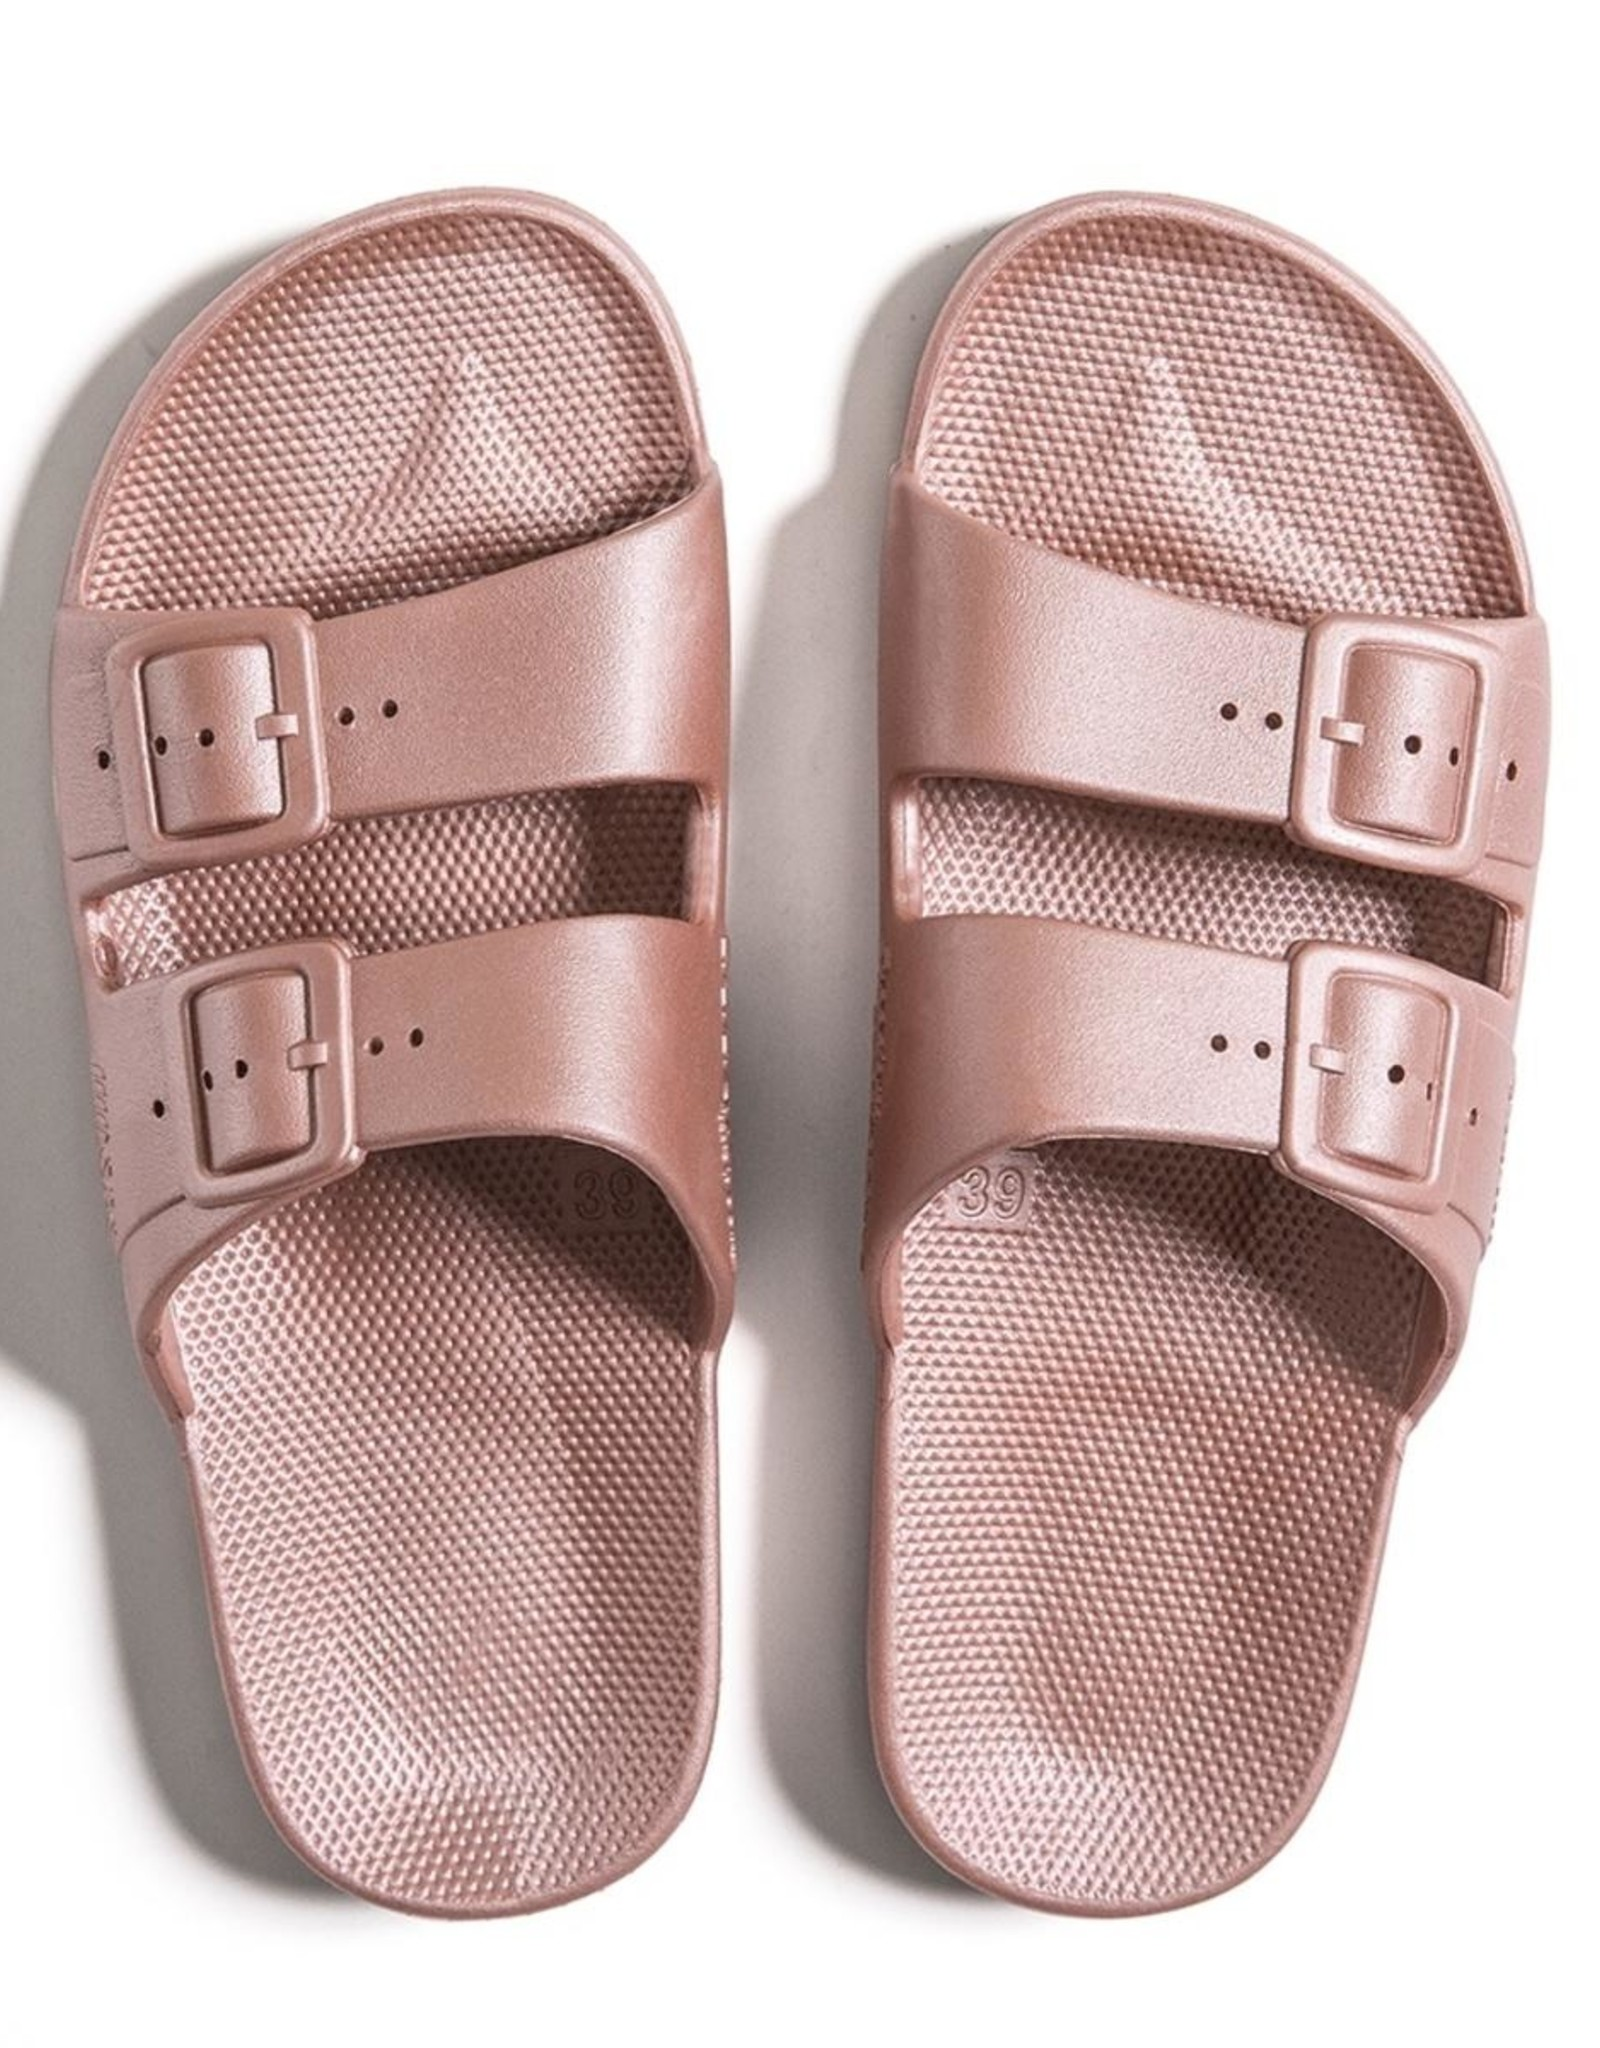 Freedom Moses Sandals VENUS - size 38-39